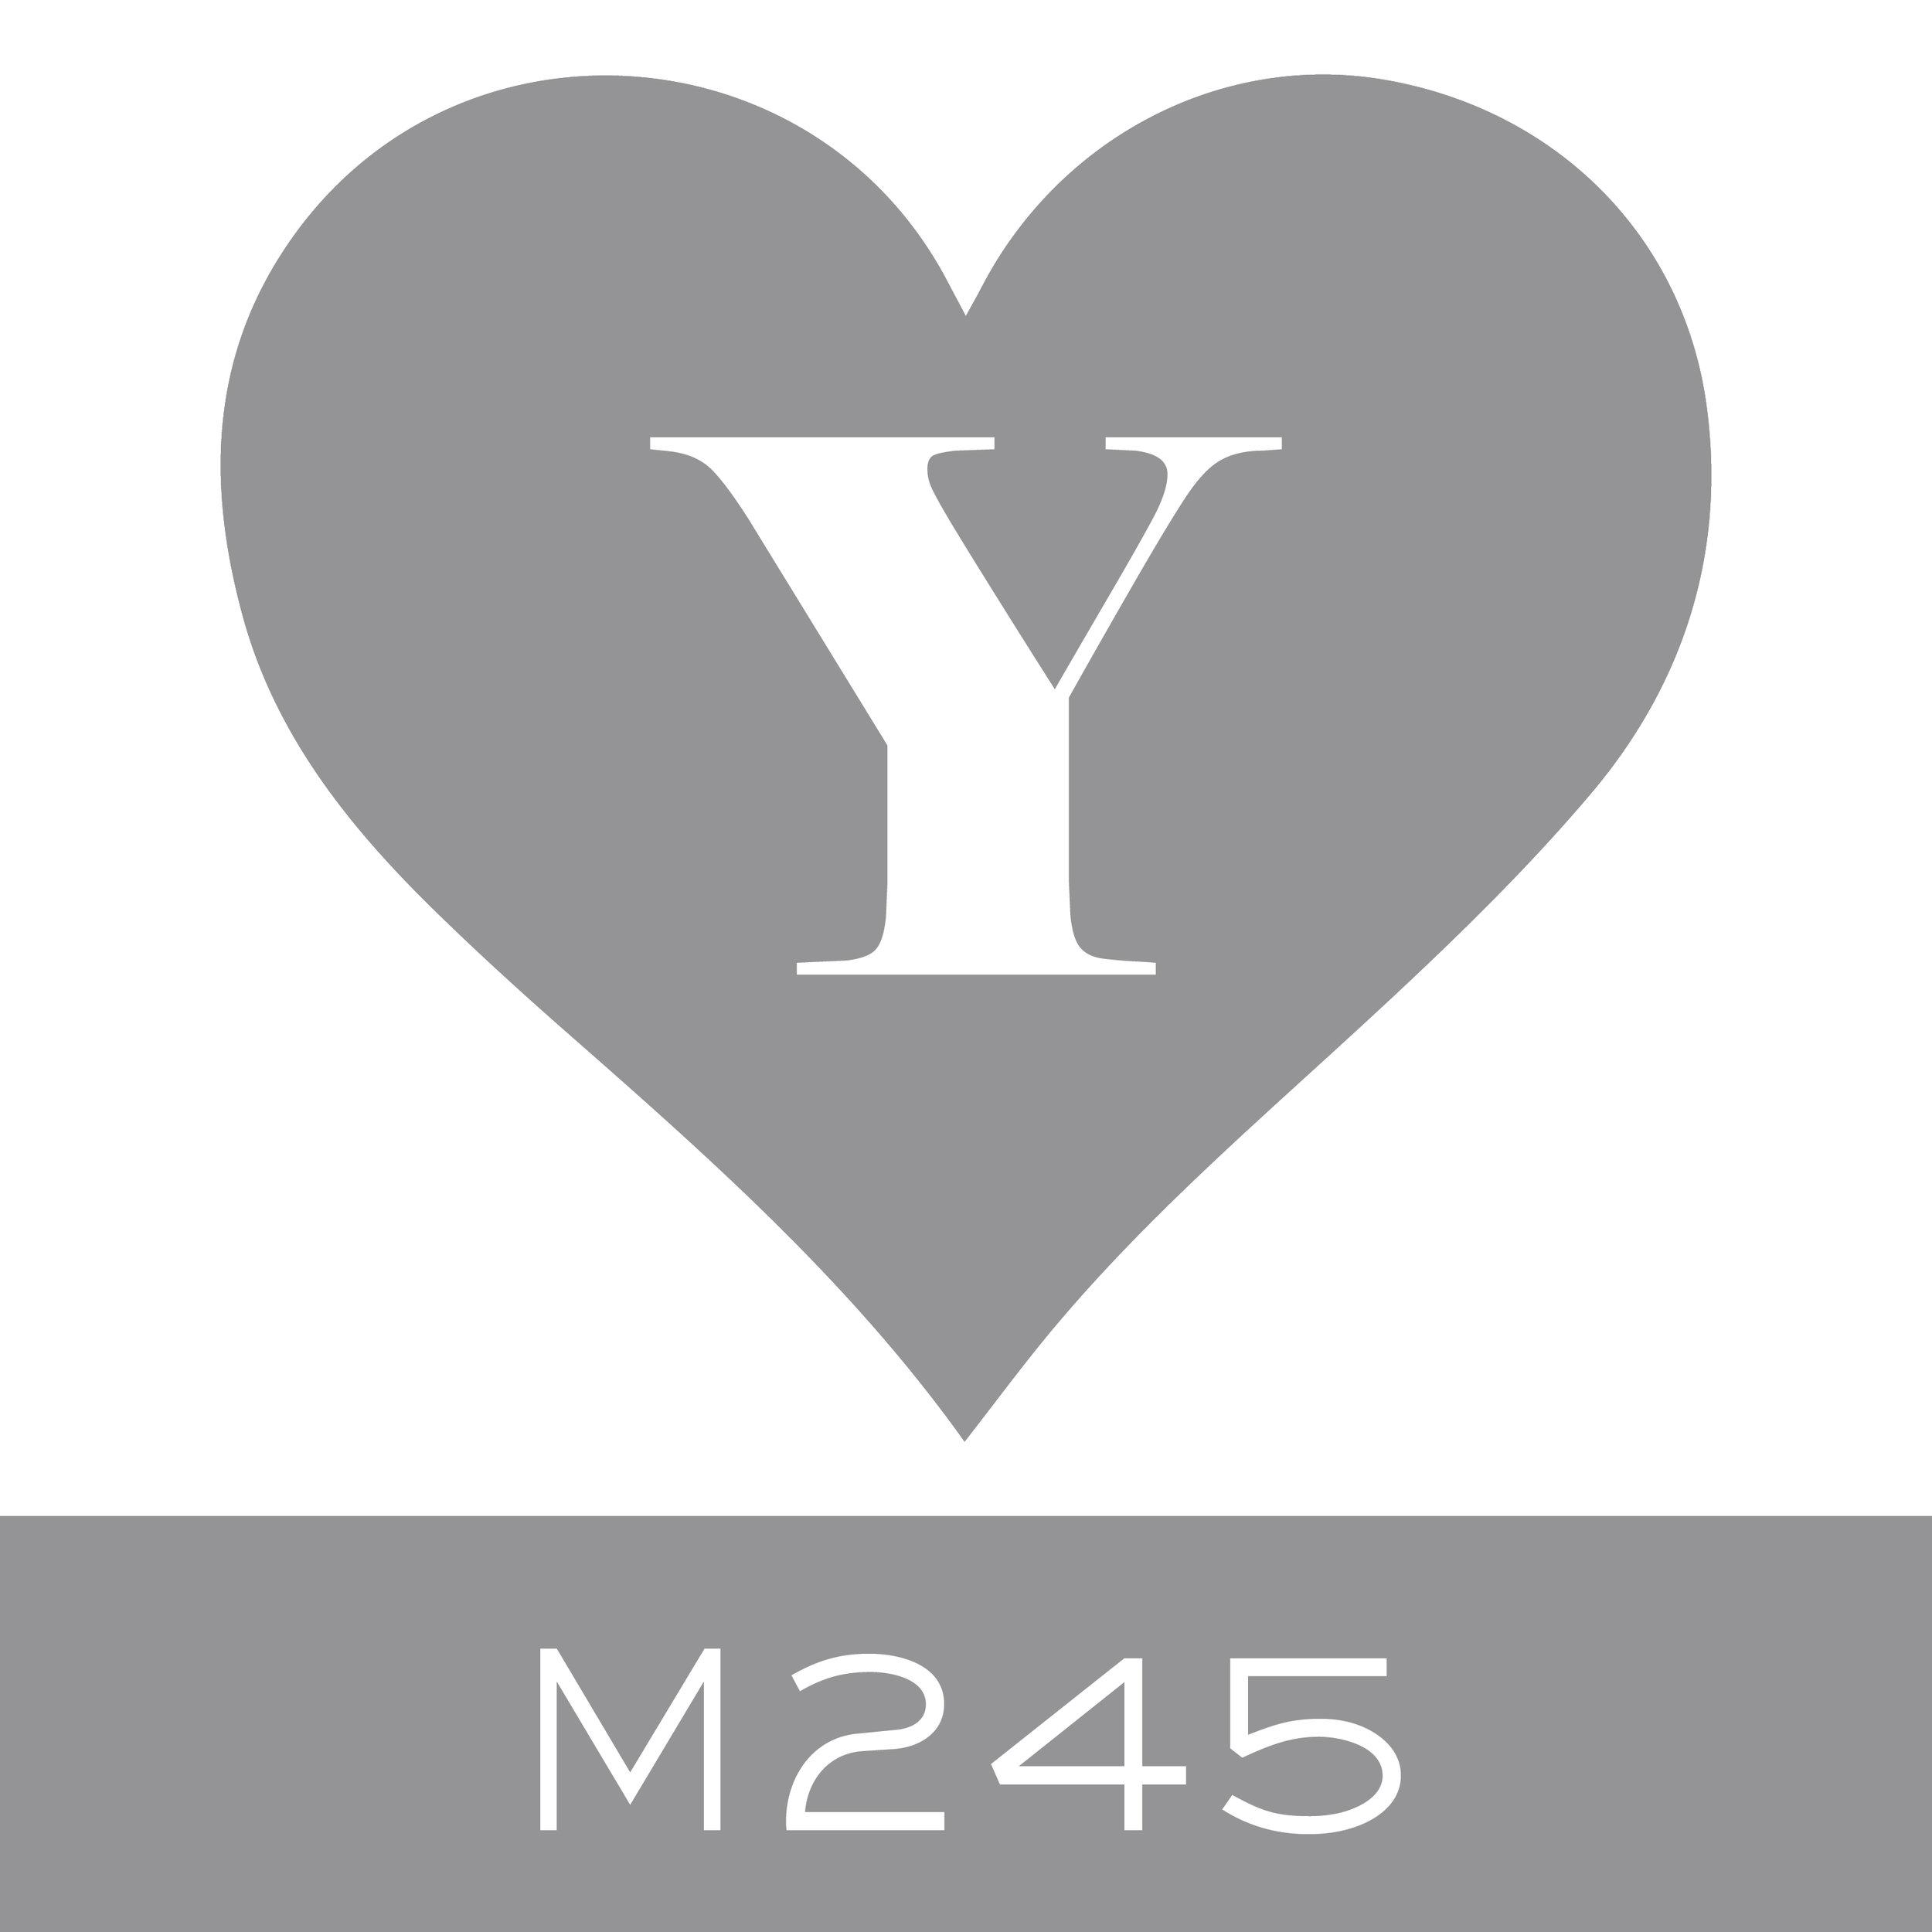 M245.jpg